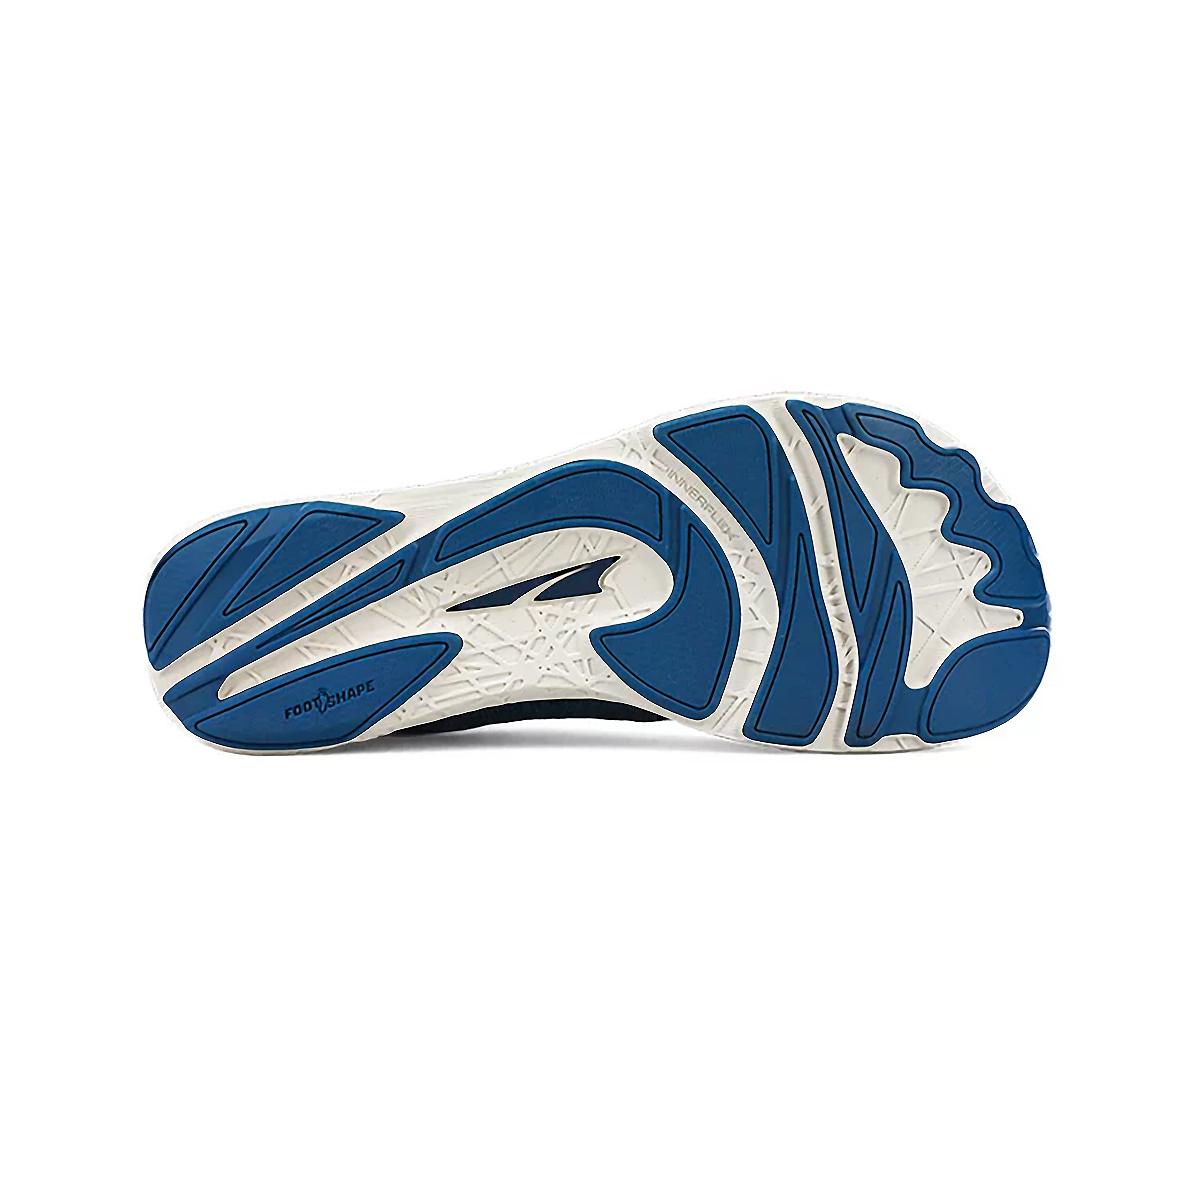 Men's Altra Escalante 2.5 Running Shoe - Color: Majolica Blue - Size: 7 - Width: Regular, Majolica Blue, large, image 4